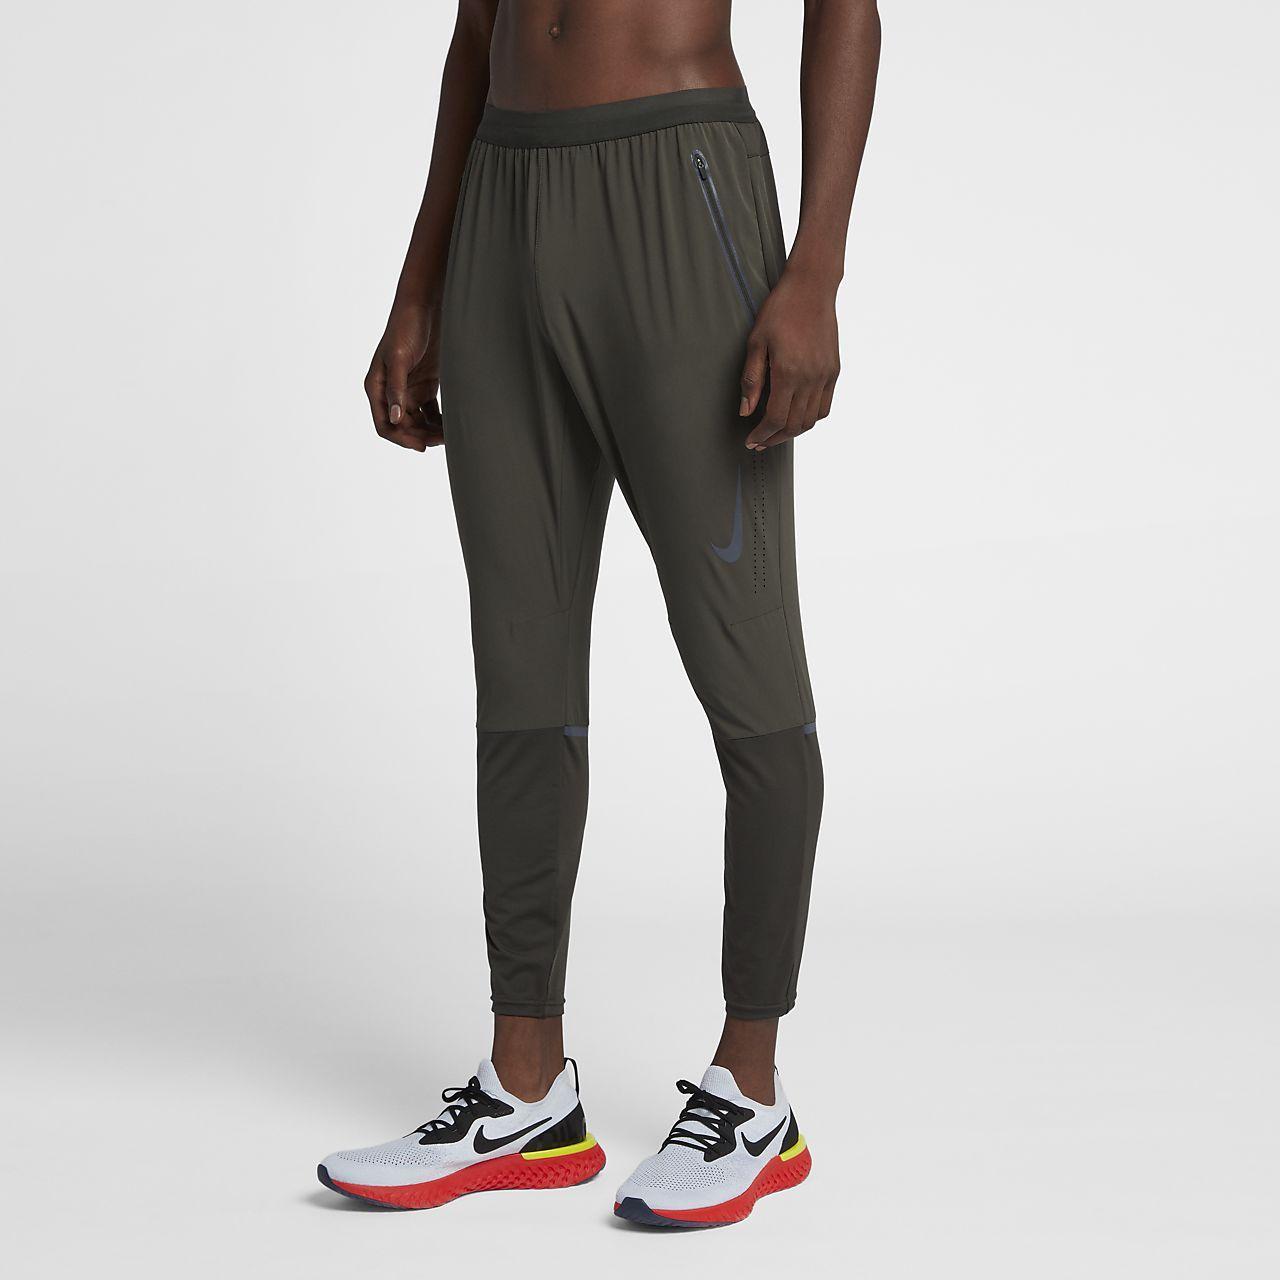 Pantaloni da running Nike Swift Uomo. IT